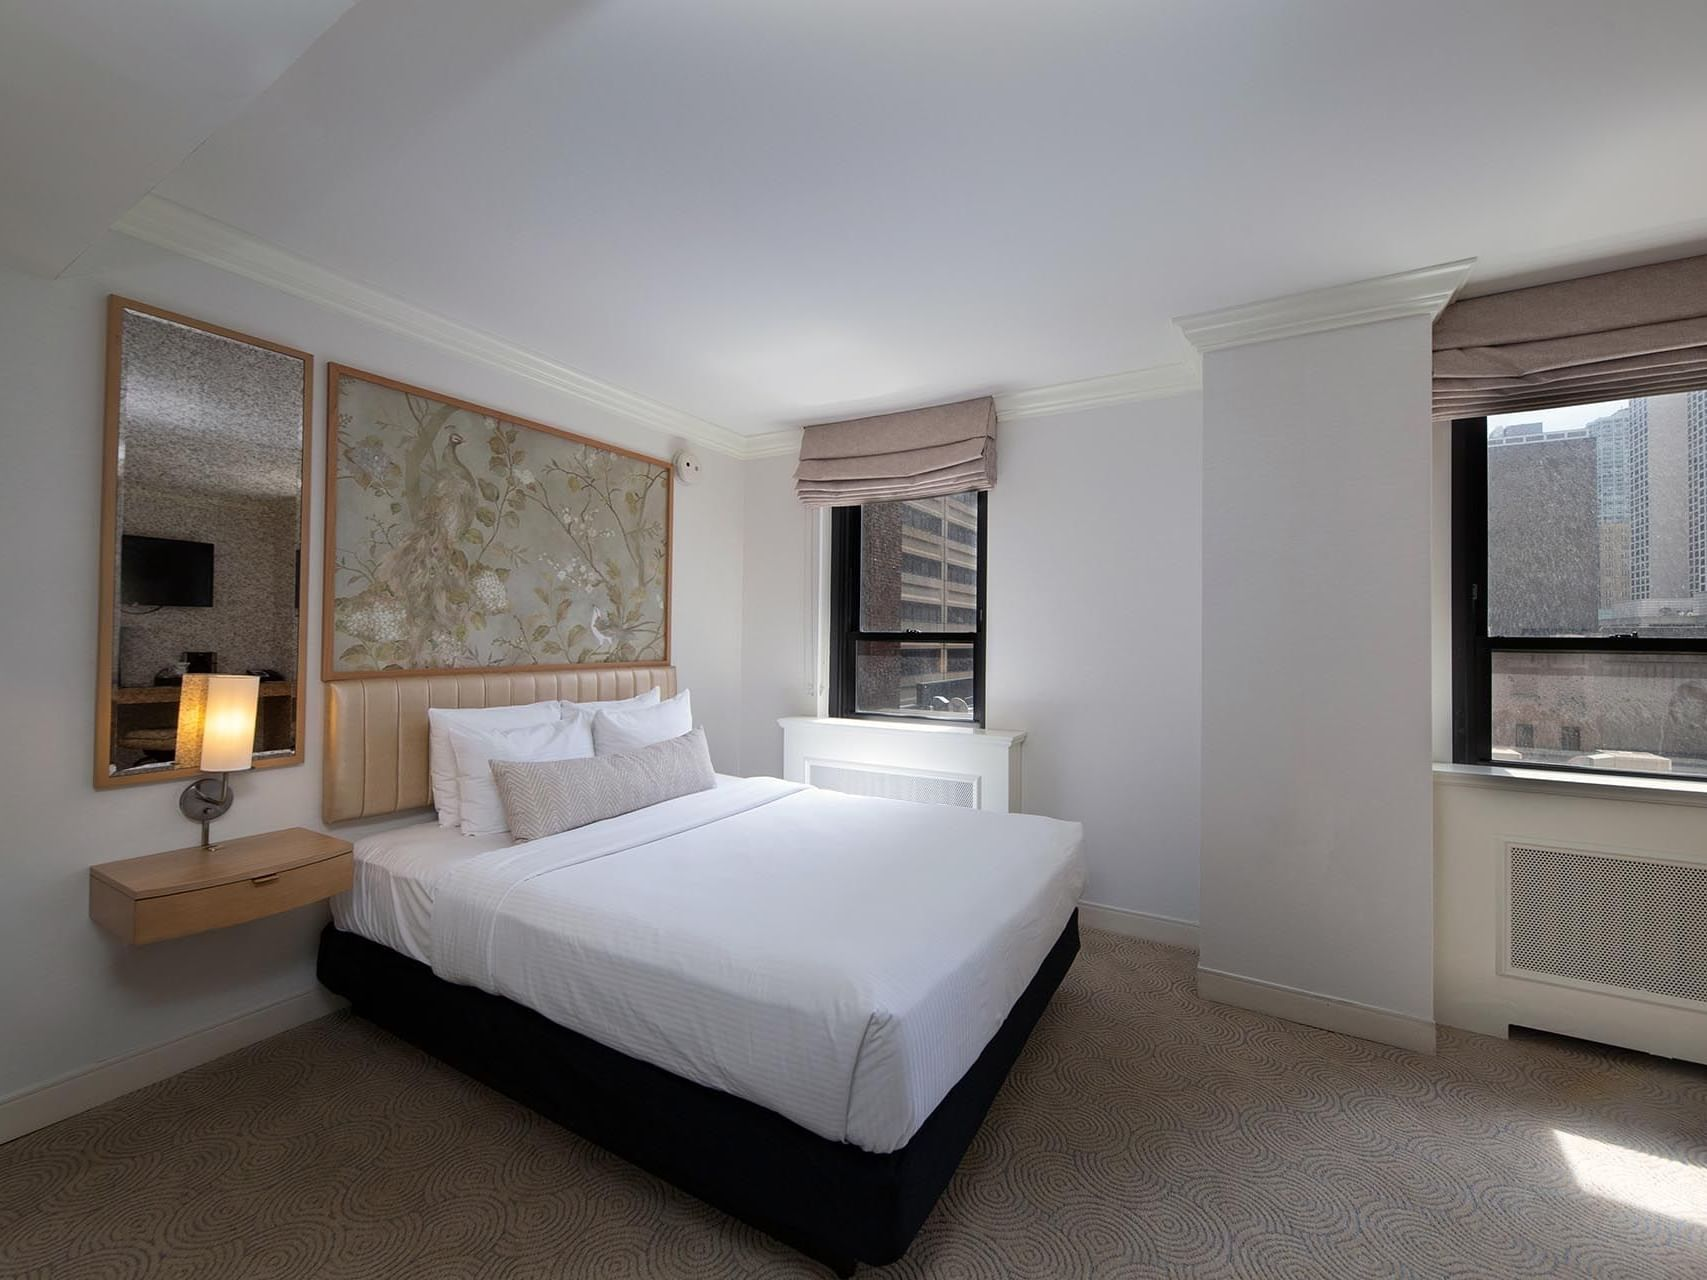 Petite Classique Room at Warwick Allerton